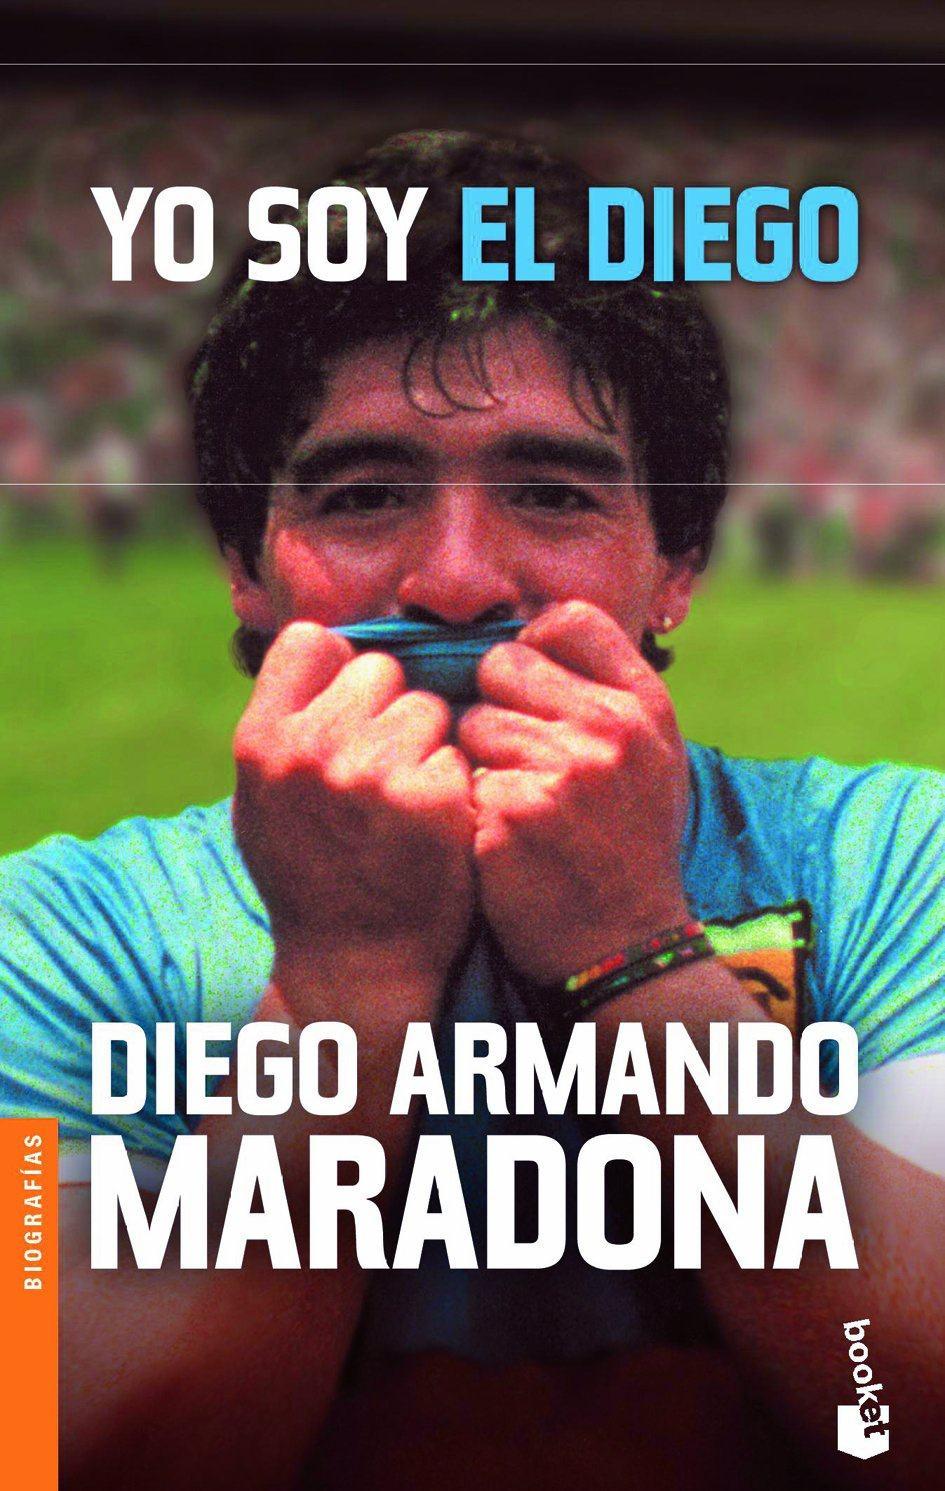 Diego Maradona anh 1